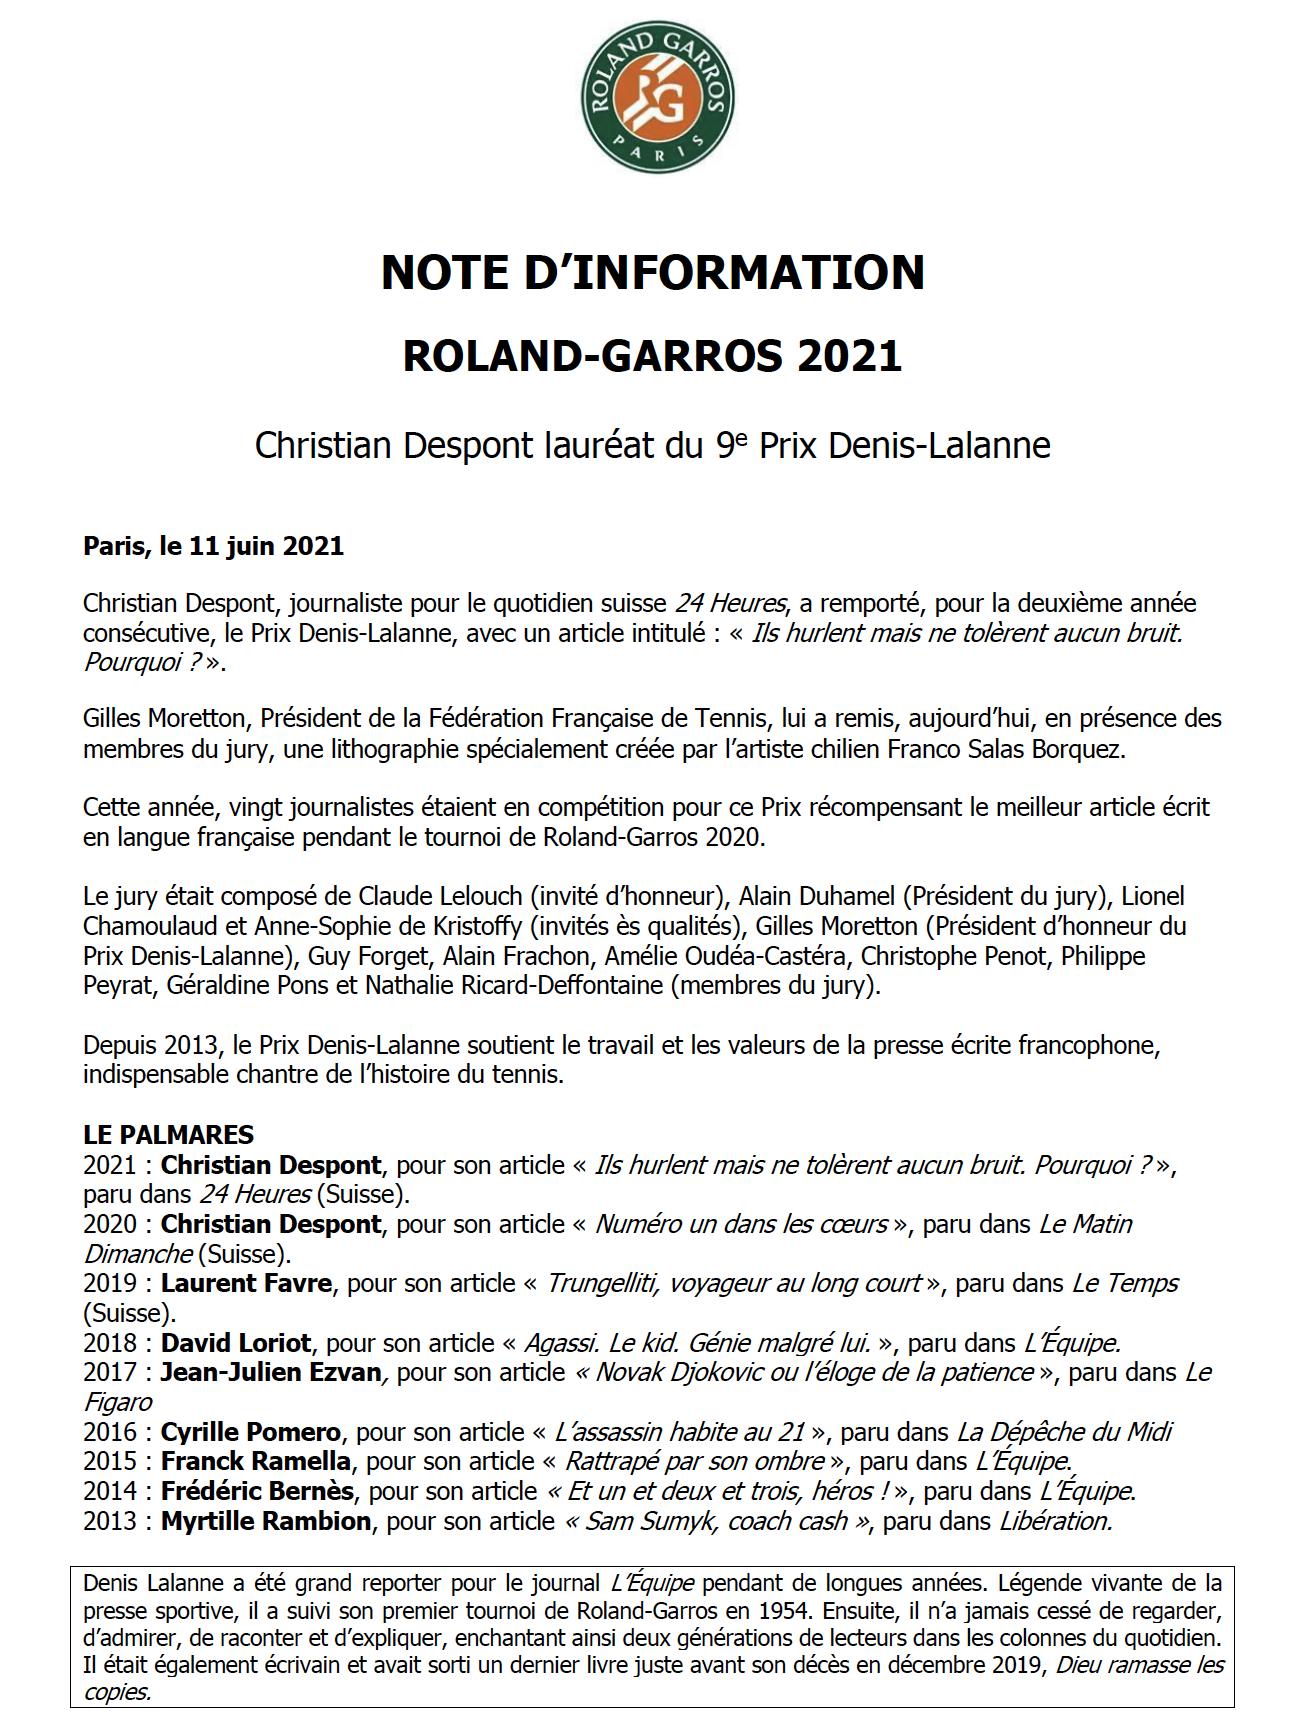 FFT 9e Prix Denis-Lalanne